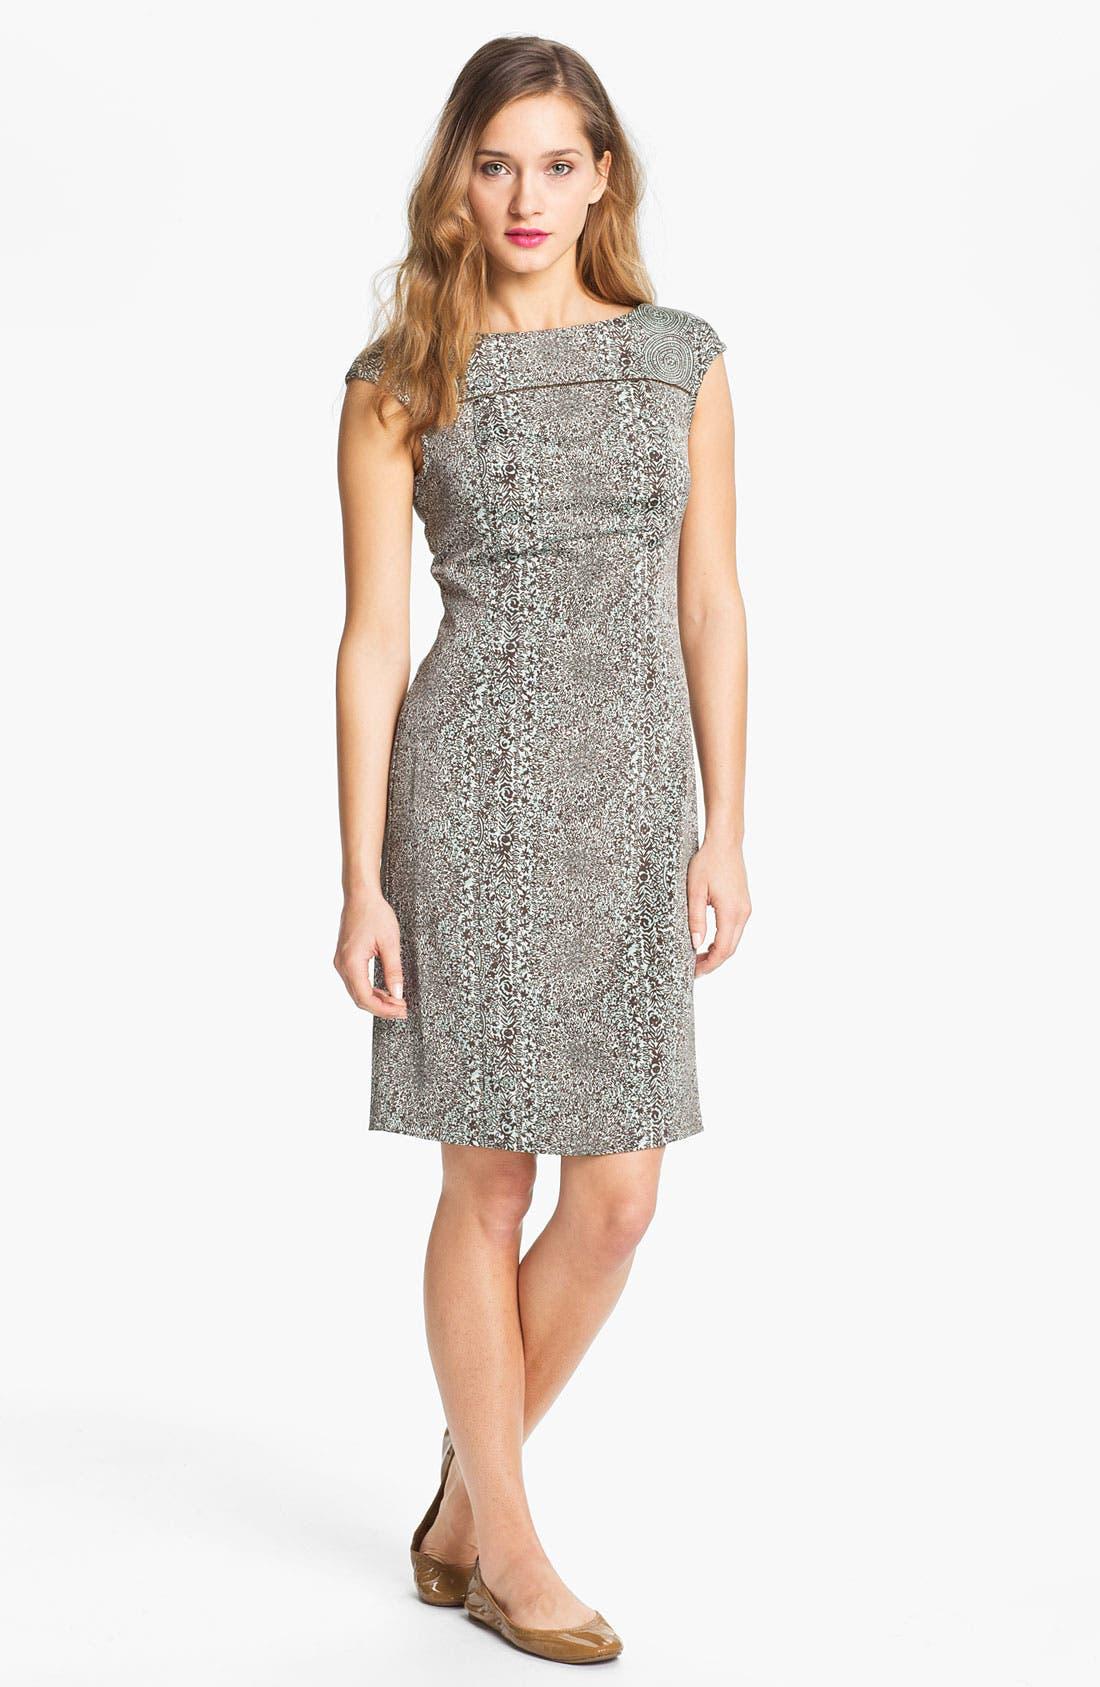 Alternate Image 1 Selected - Tory Burch 'Carter' Print Sheath Dress